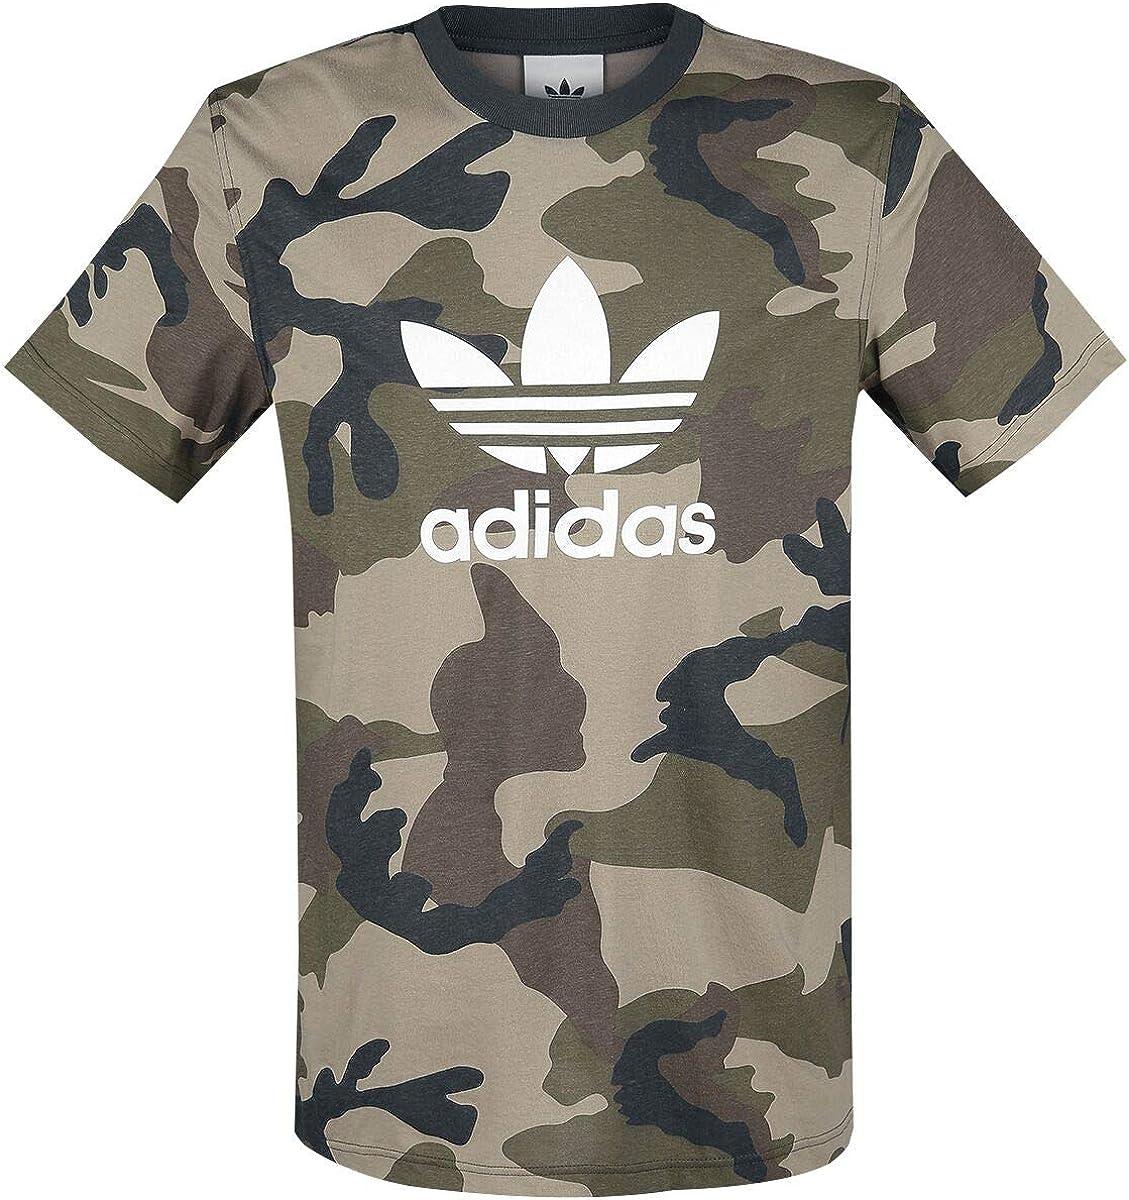 eje negativo estas  Adidas Camo Tee Men's T-Shirt: Amazon.de: Bekleidung